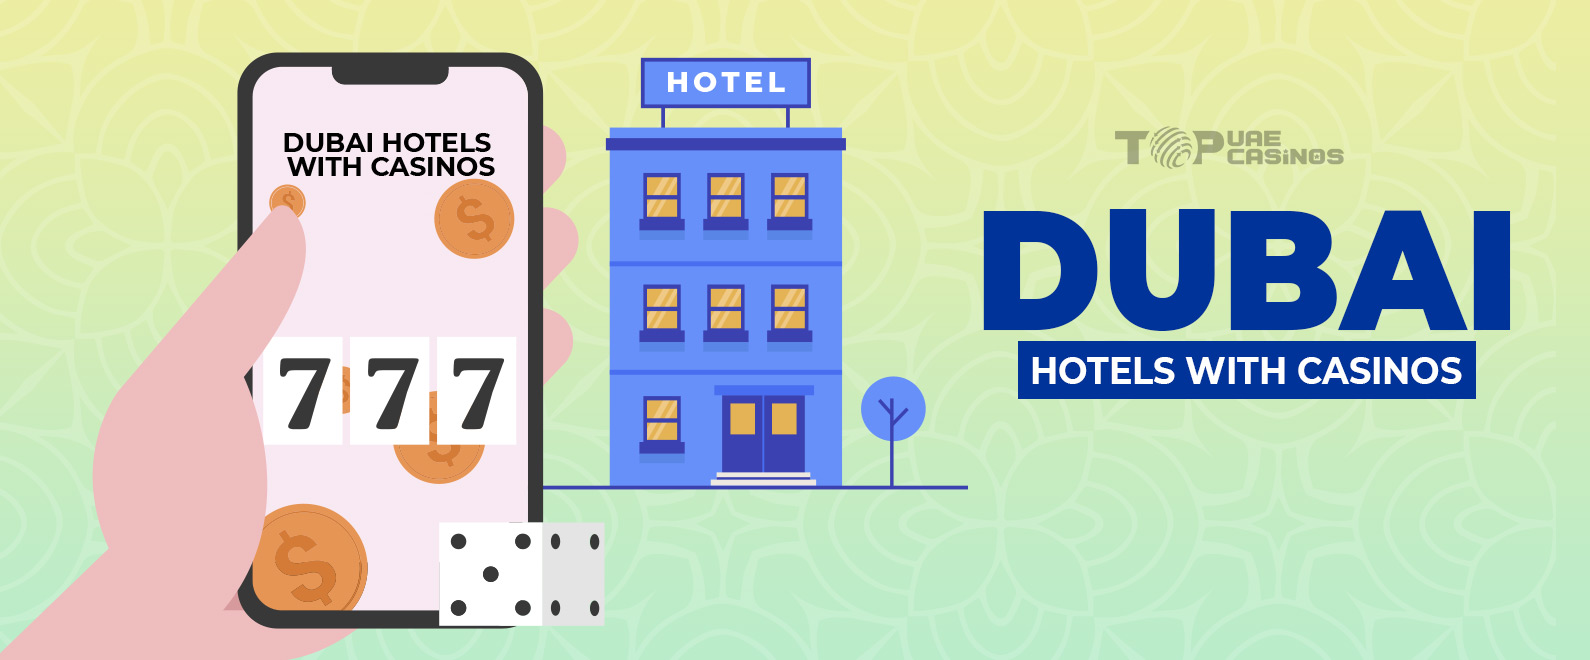 Dubai hotels with casinos